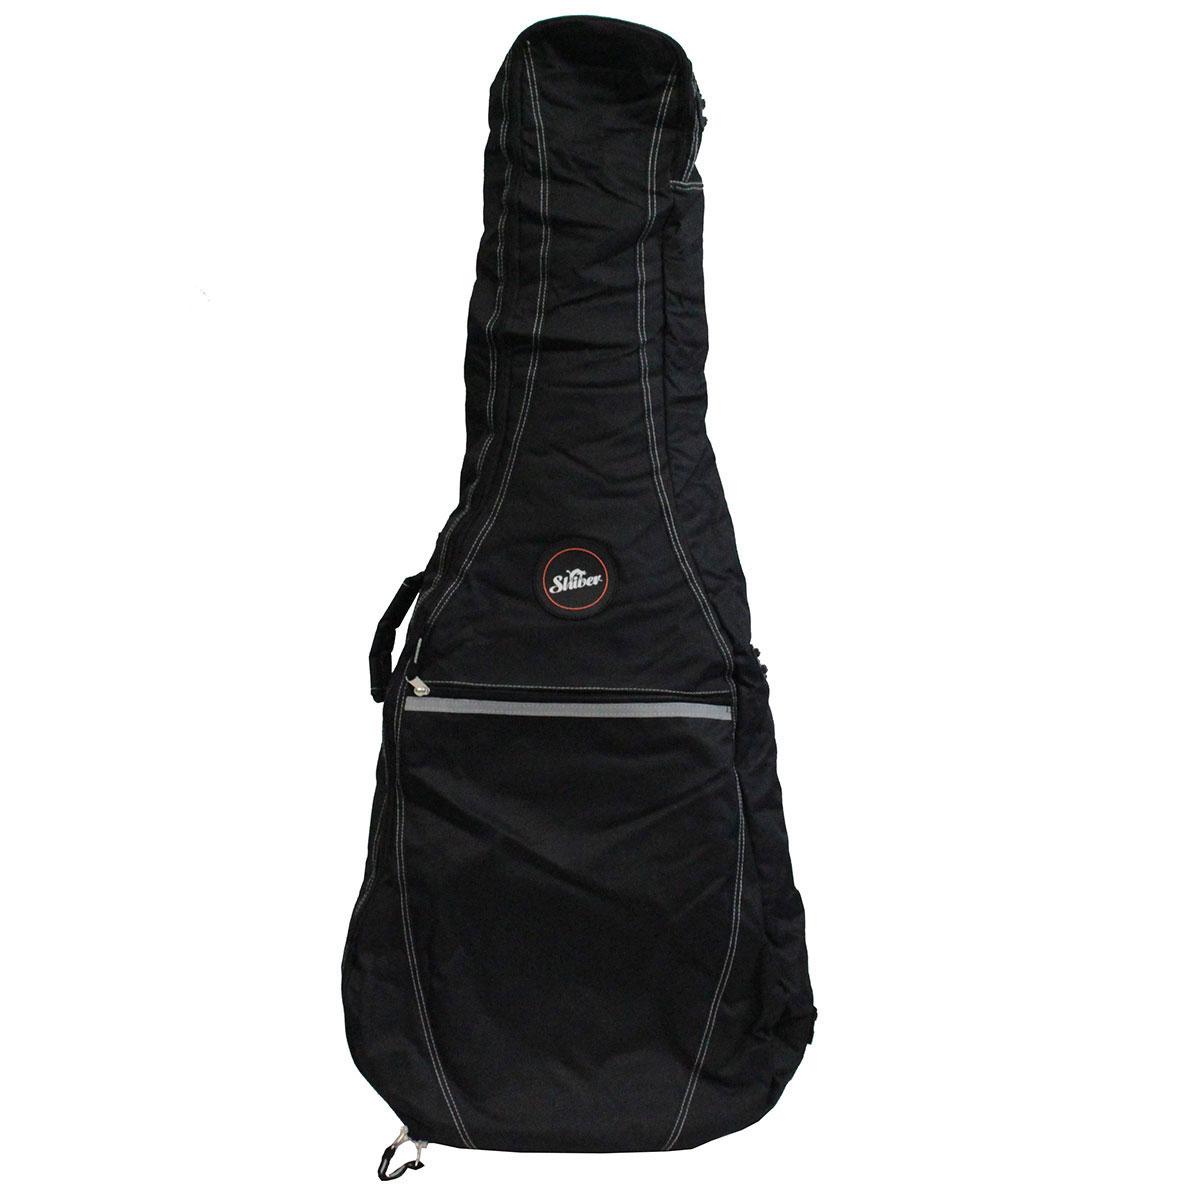 Shiver - Housse guitare folk/classique 4/4 standard